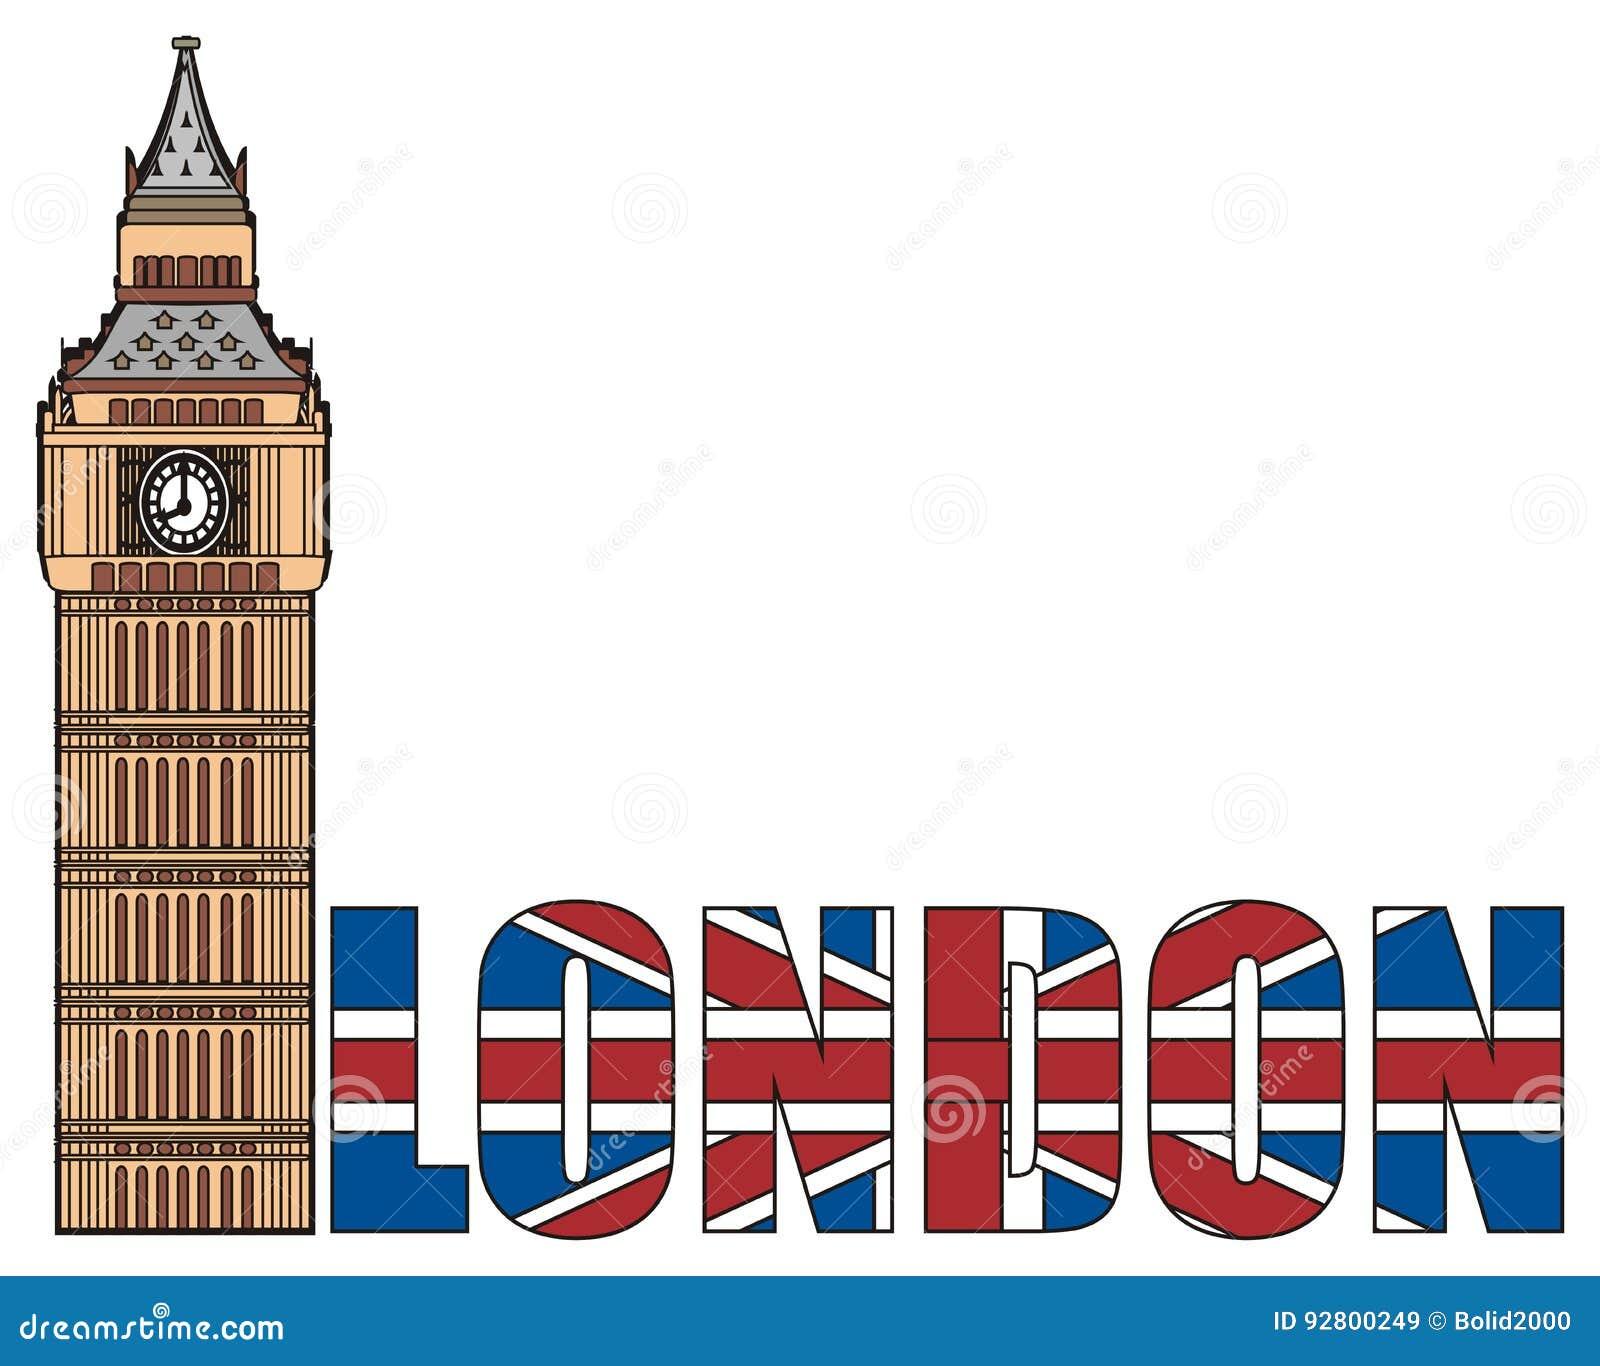 big ben tower with word stock illustration illustration of english rh dreamstime com big ben clipart images big ben clipart free